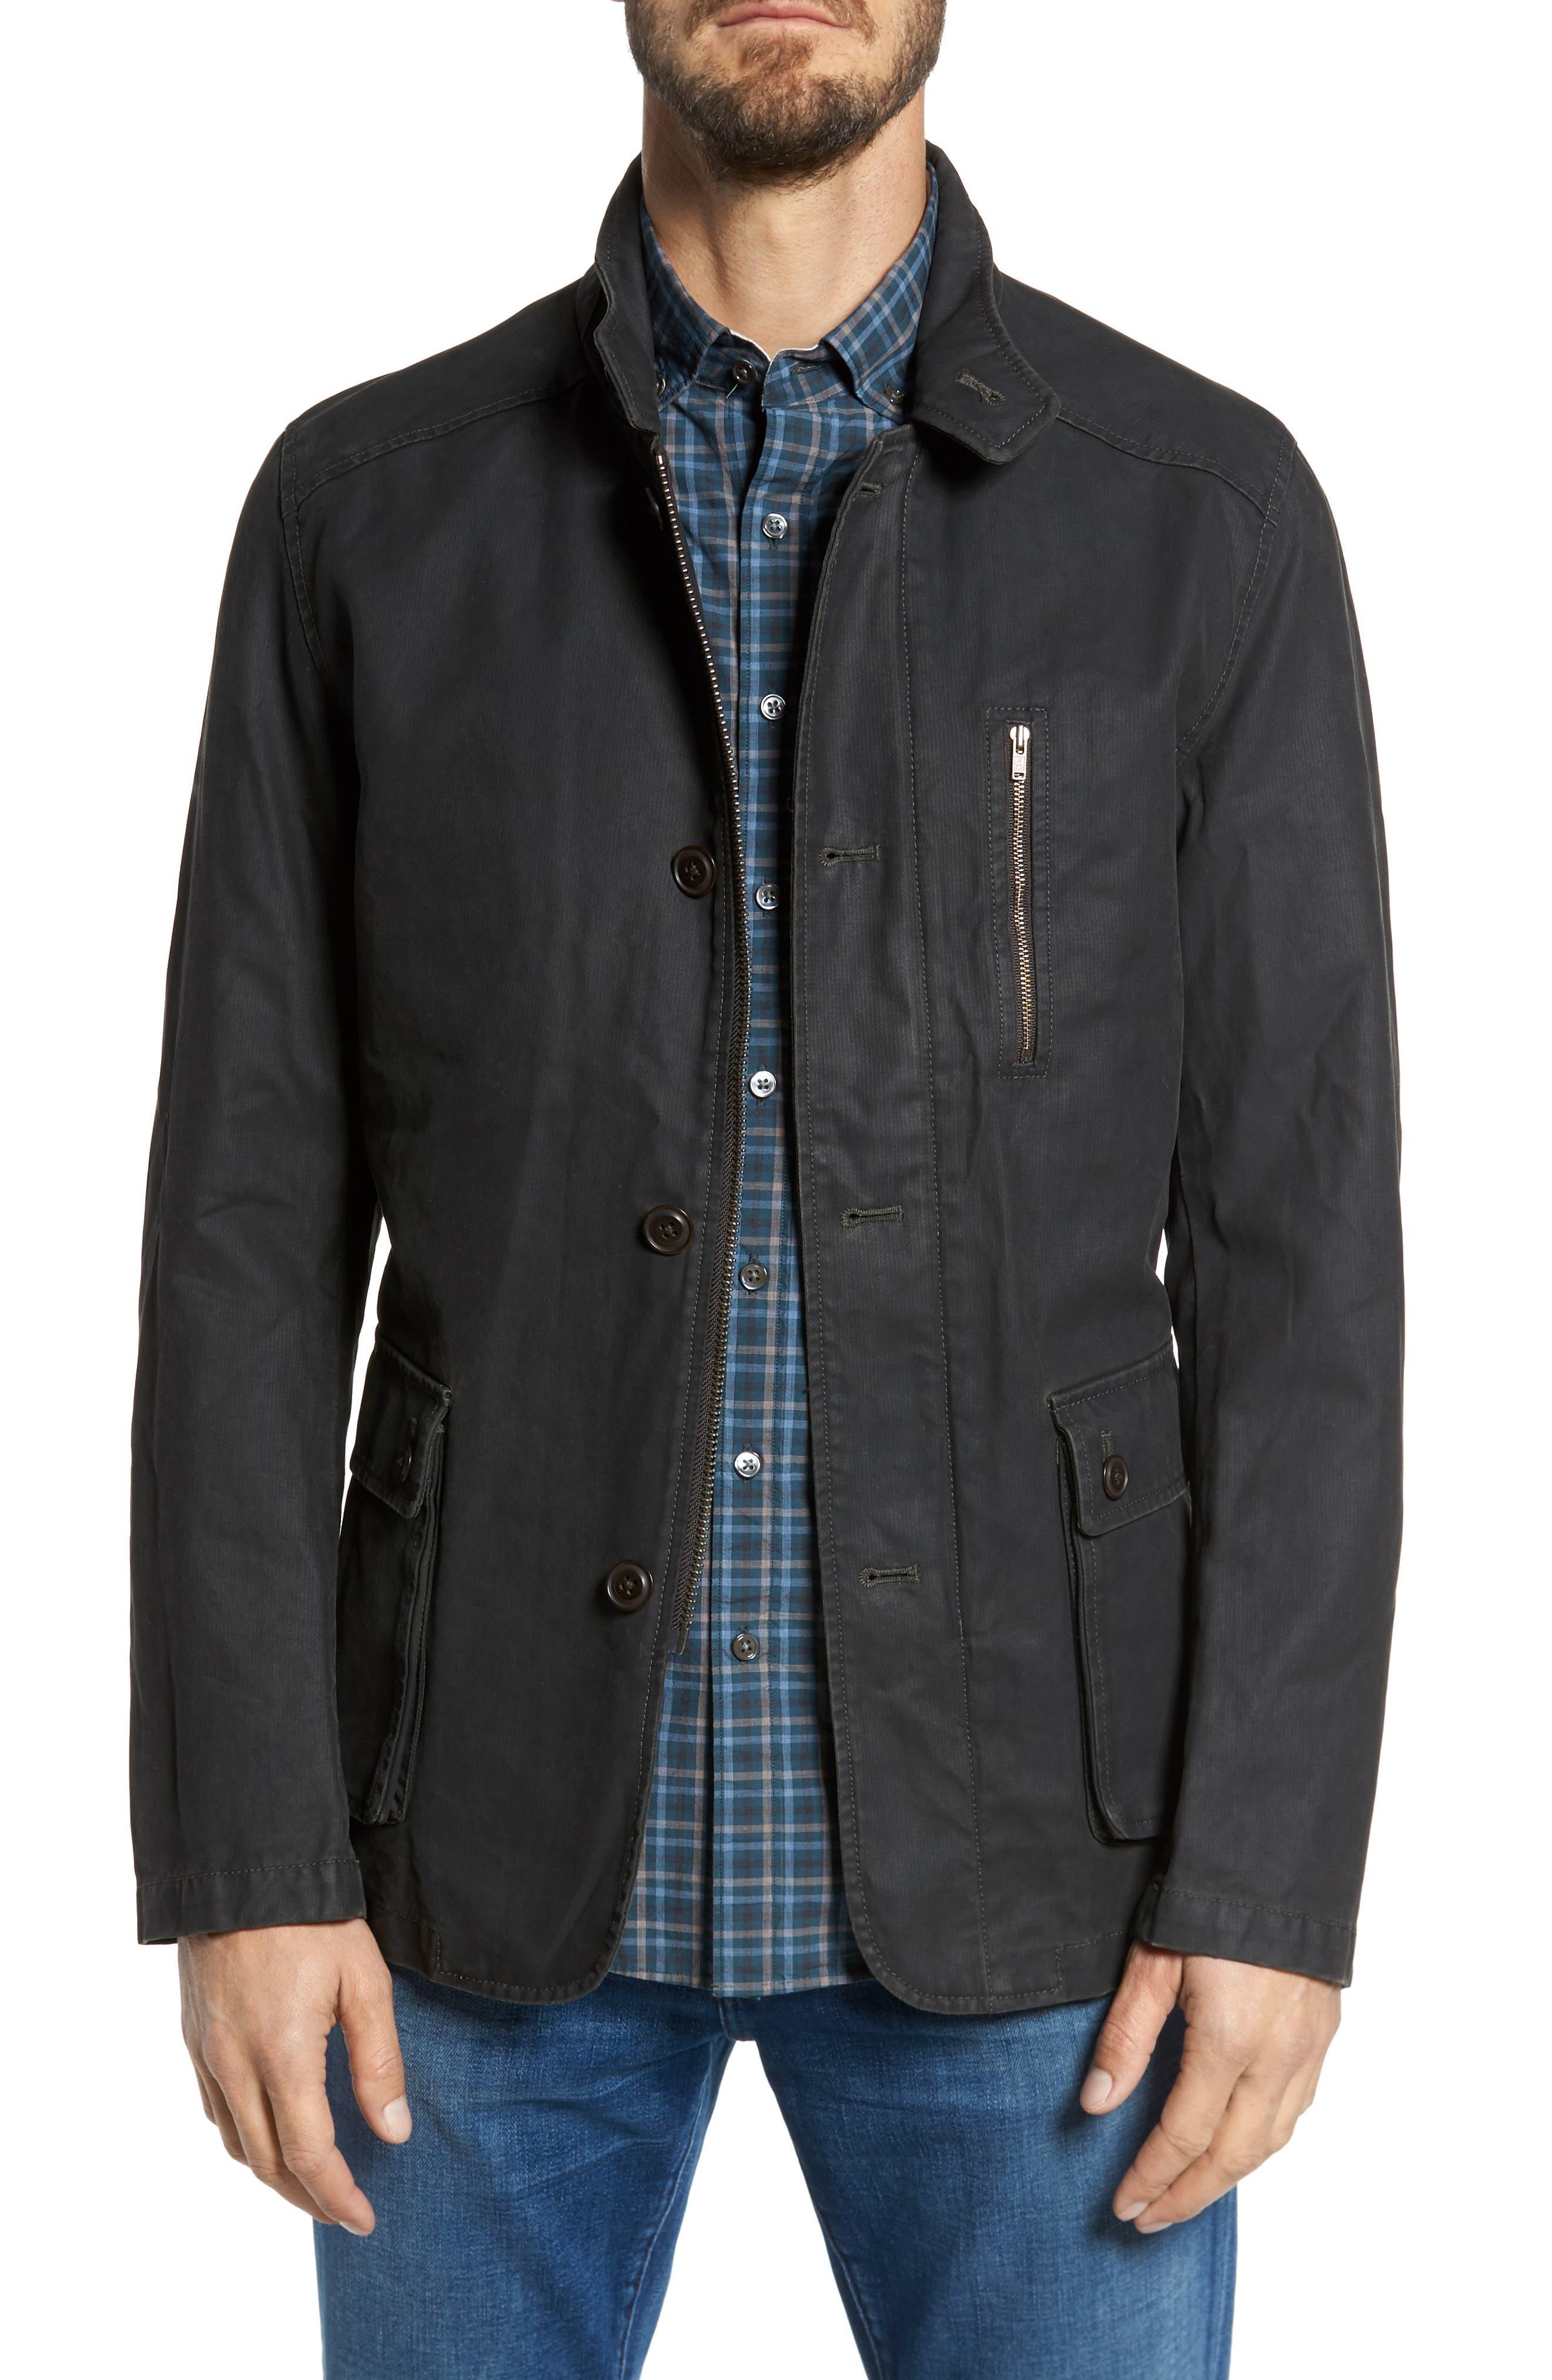 Blackmount Water-Resistant Jacket,                             Main thumbnail 1, color,                             302